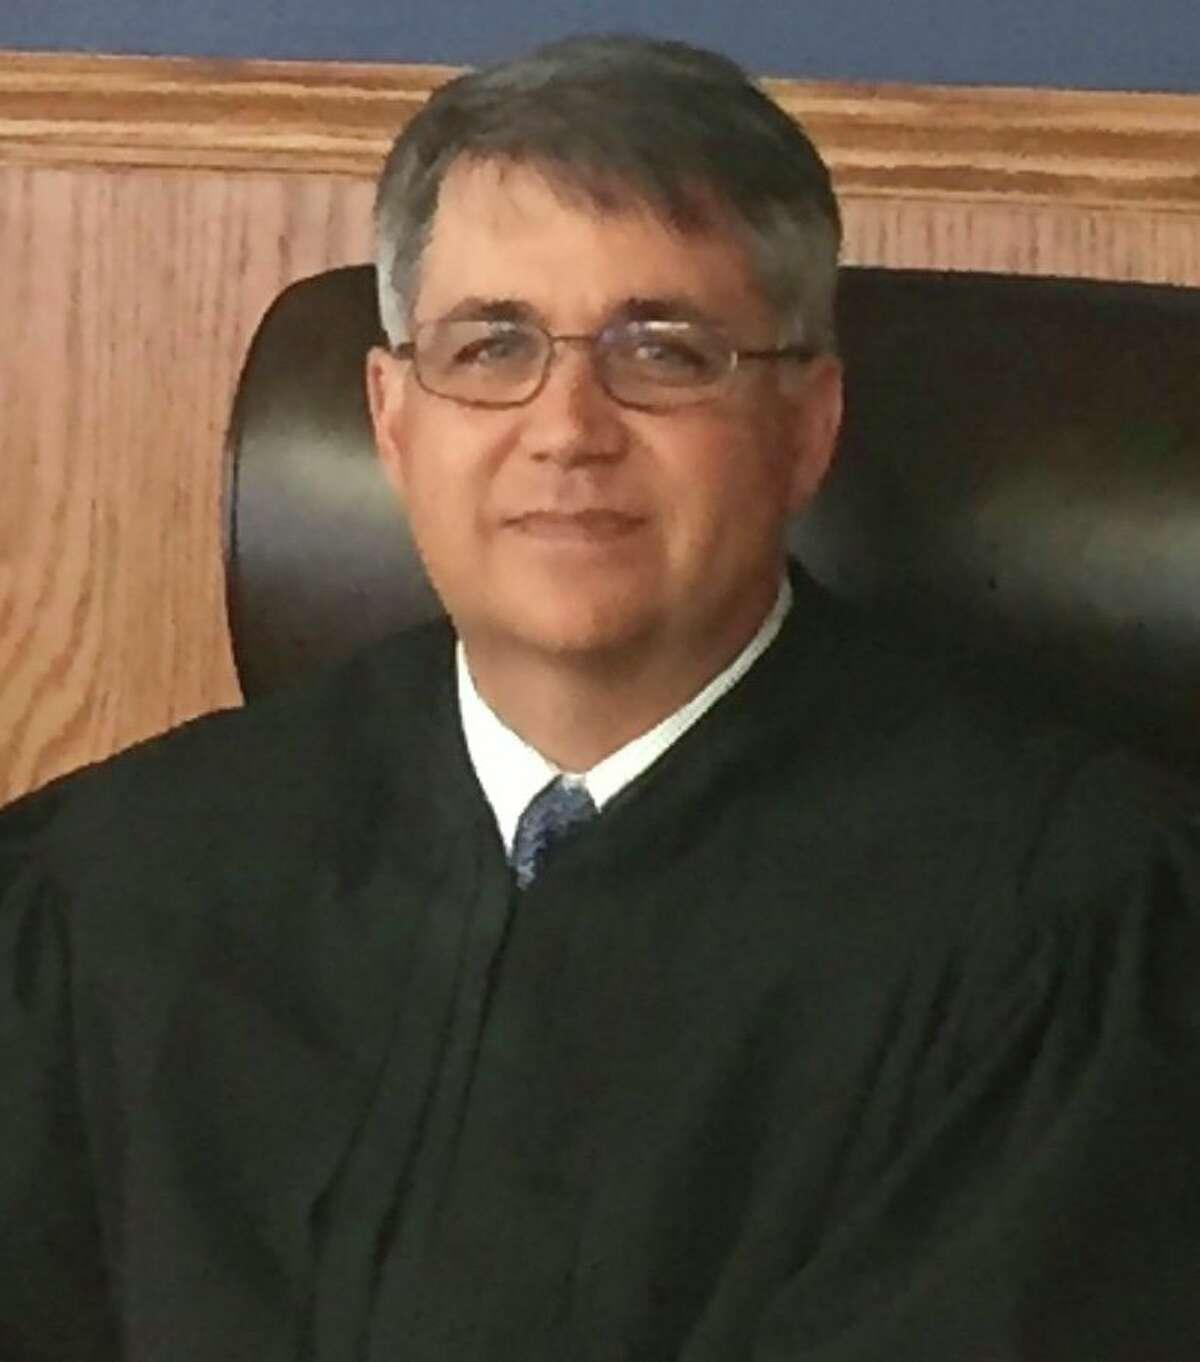 Judge David Thompson